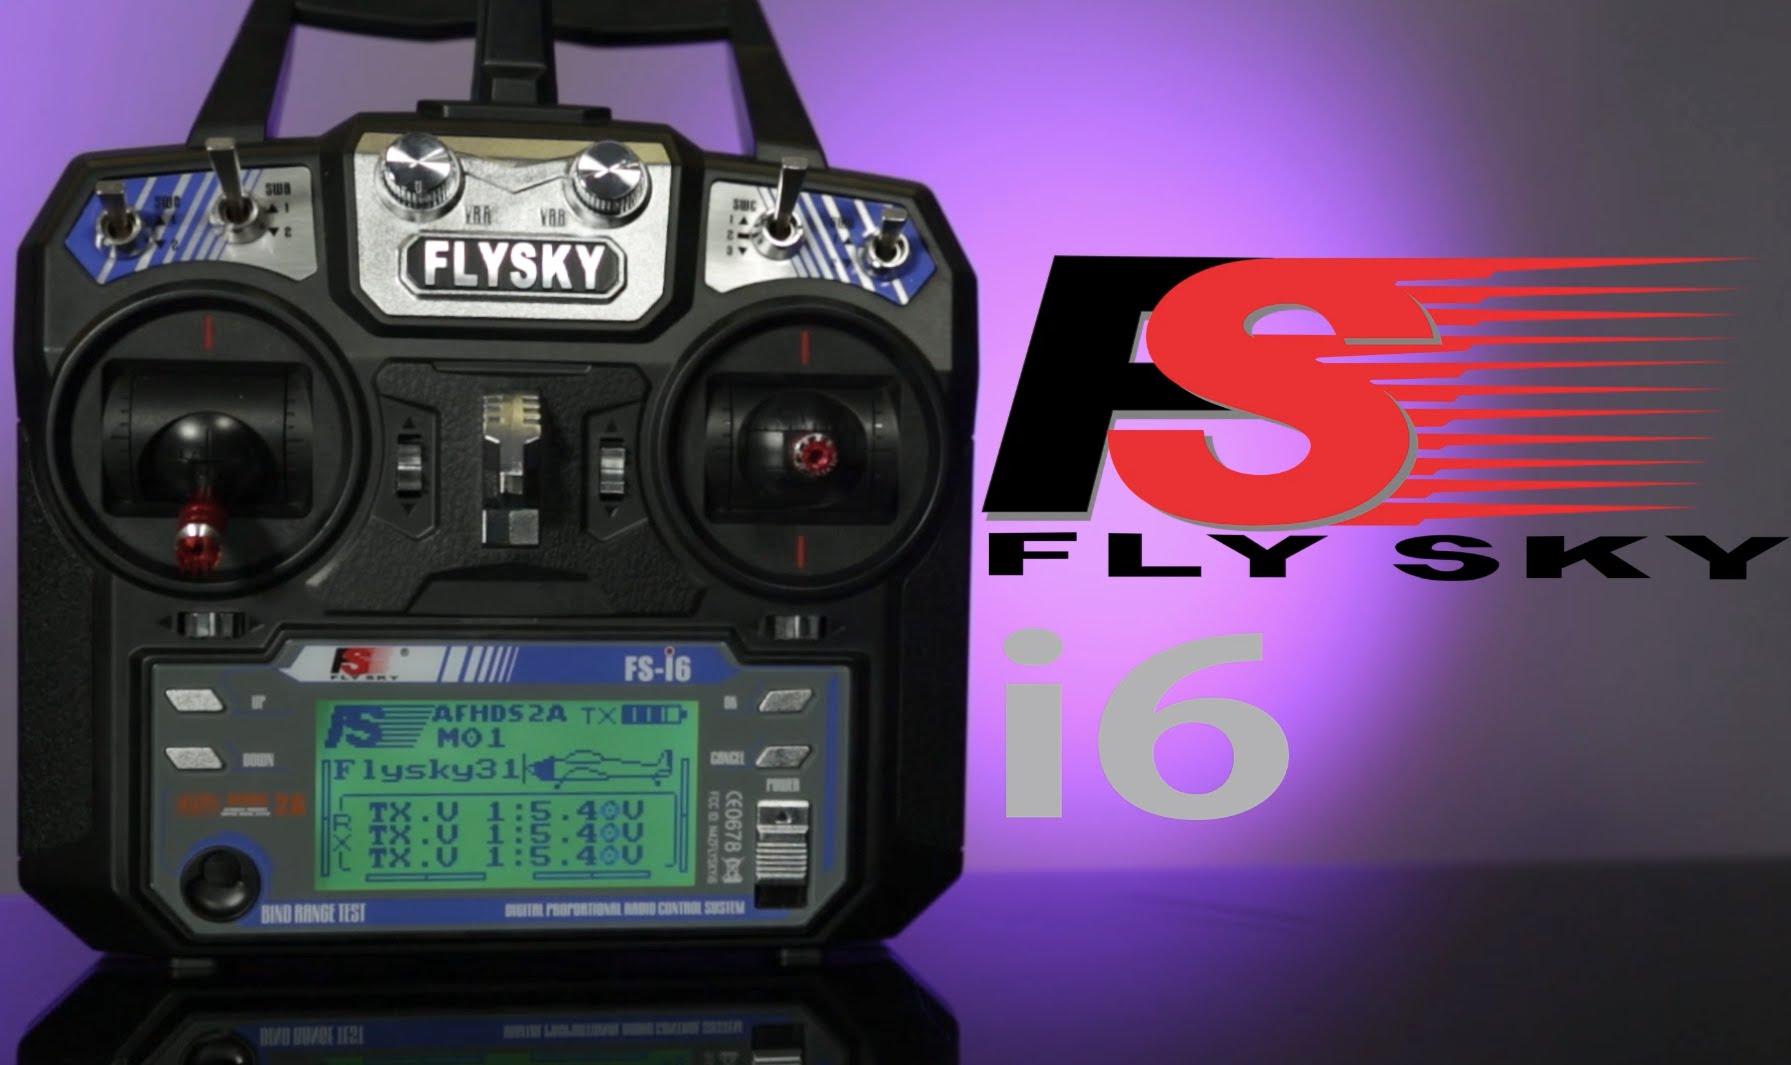 Flysky FS i-6